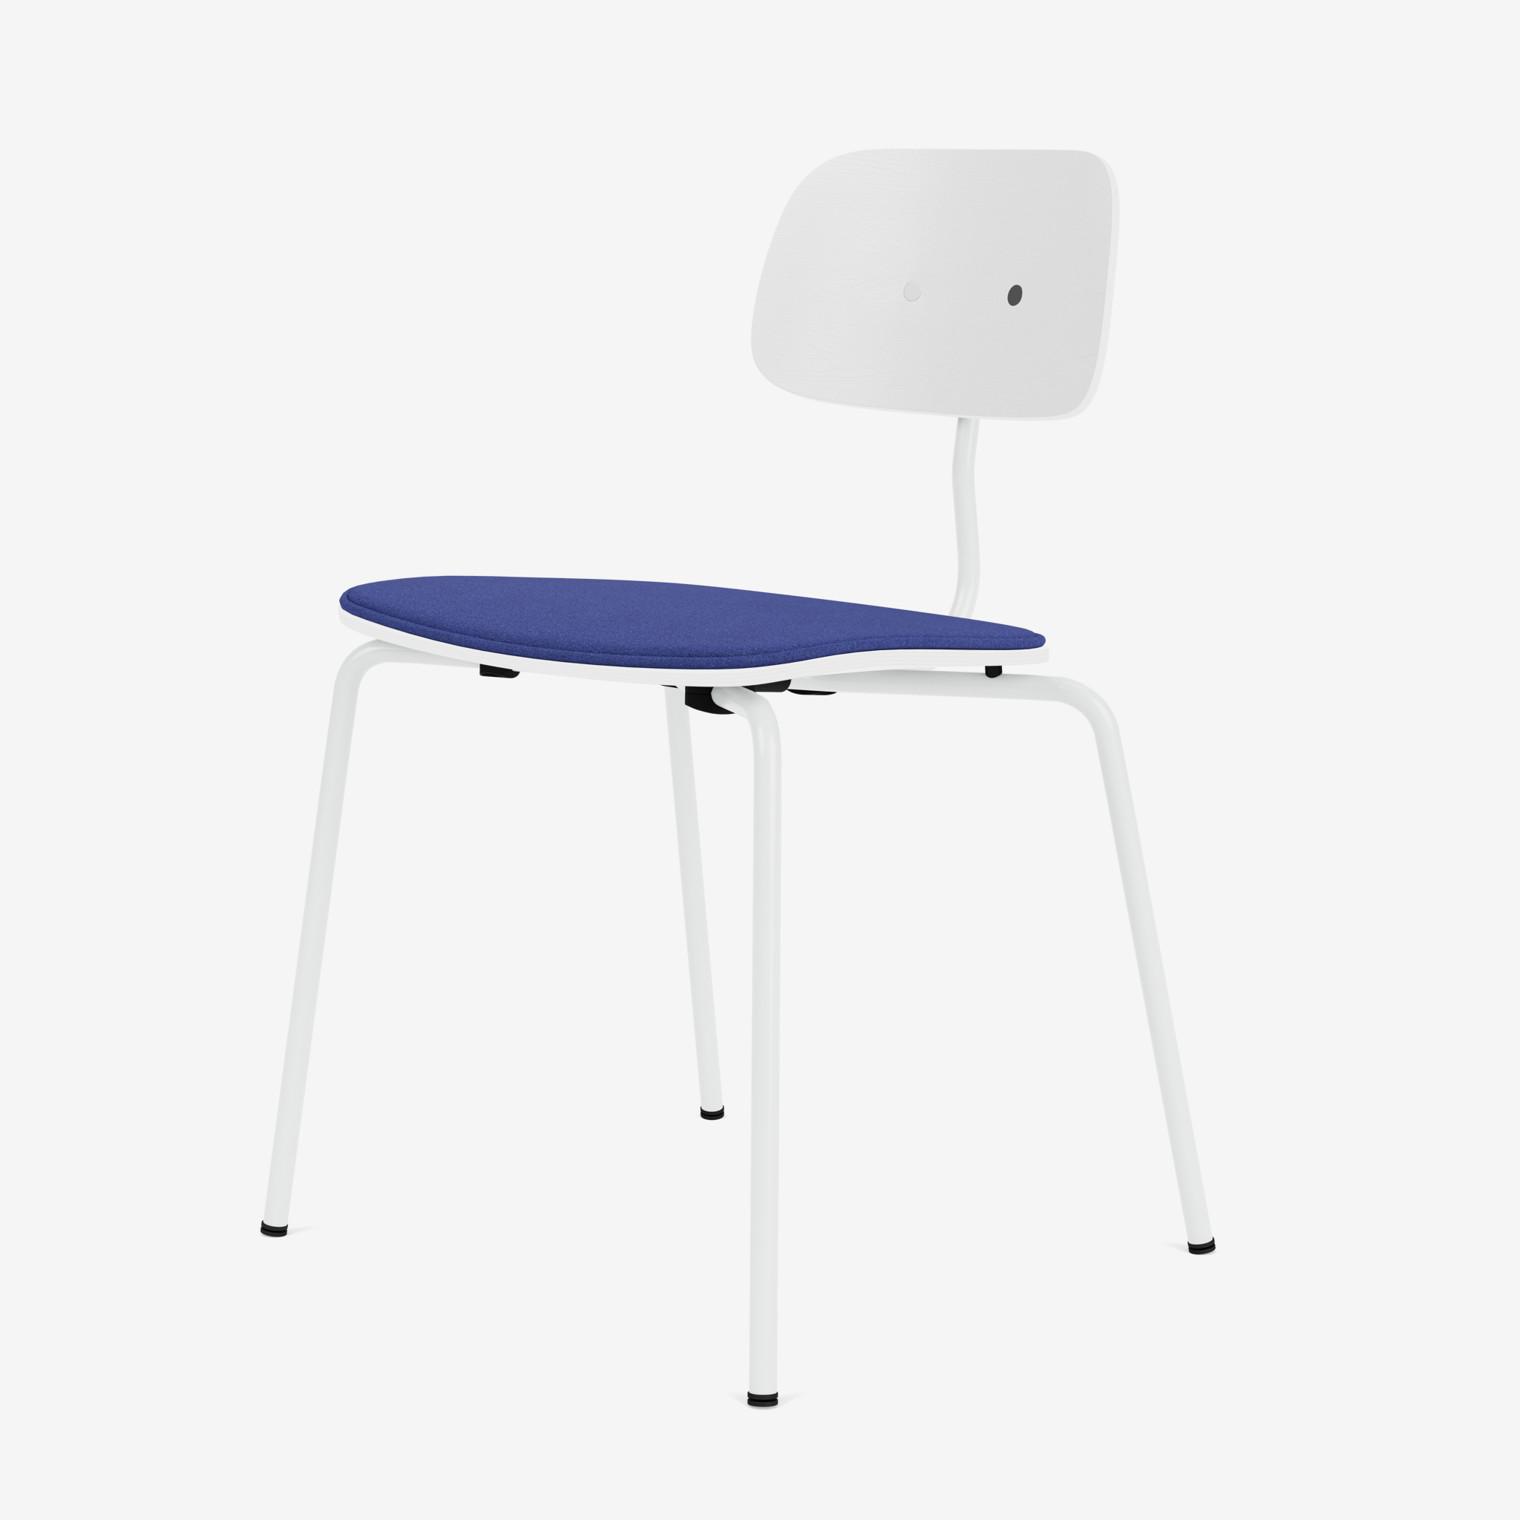 KEVI 2060 chair